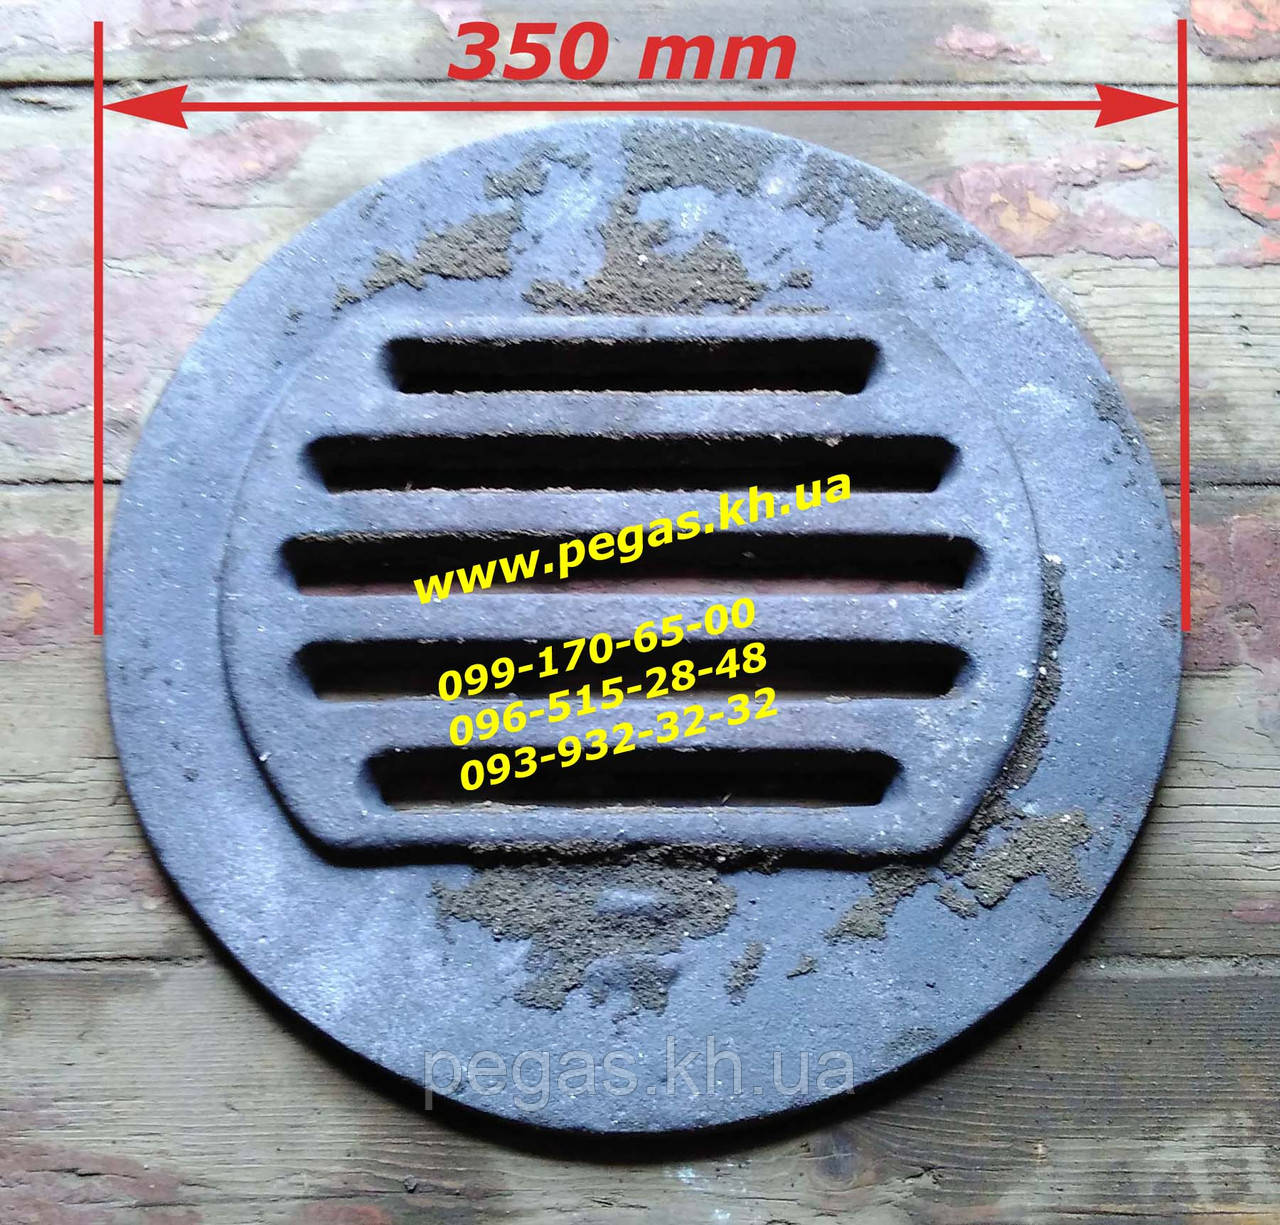 Решетка чугунная круглая титан буржуйка, тандыр, печи, мангал, 350 мм колосник